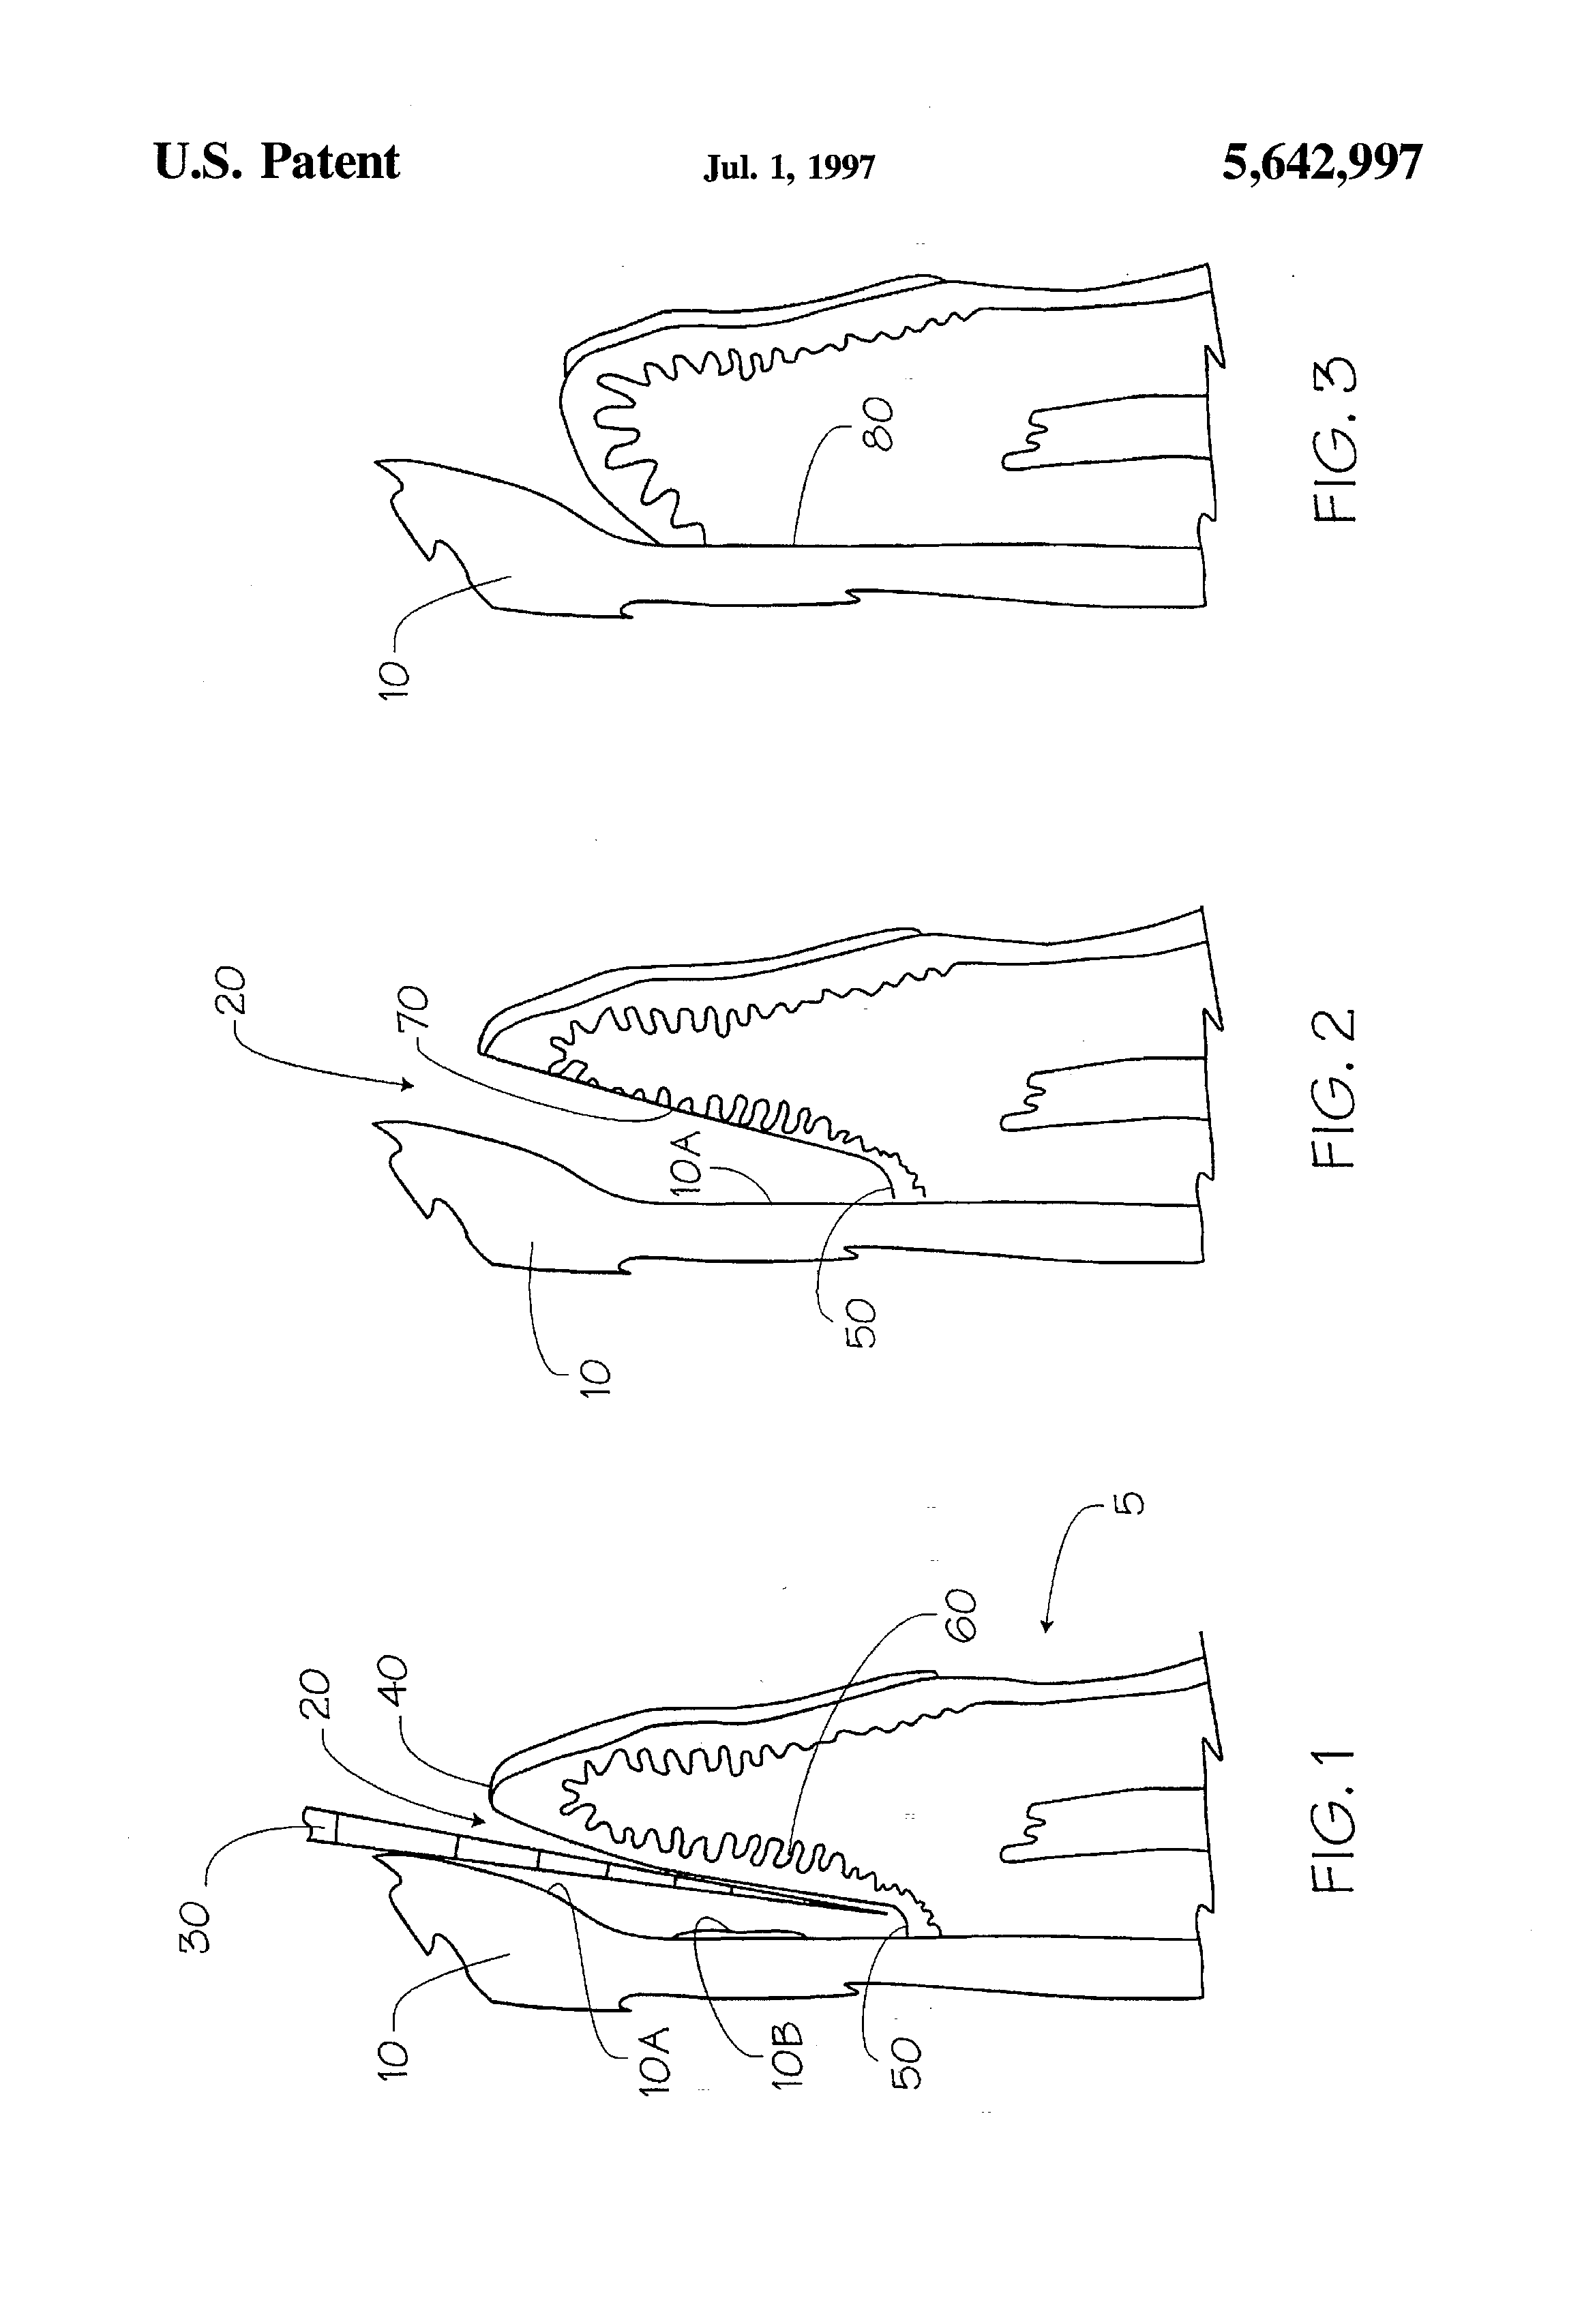 Laser excisional new attachment procedure